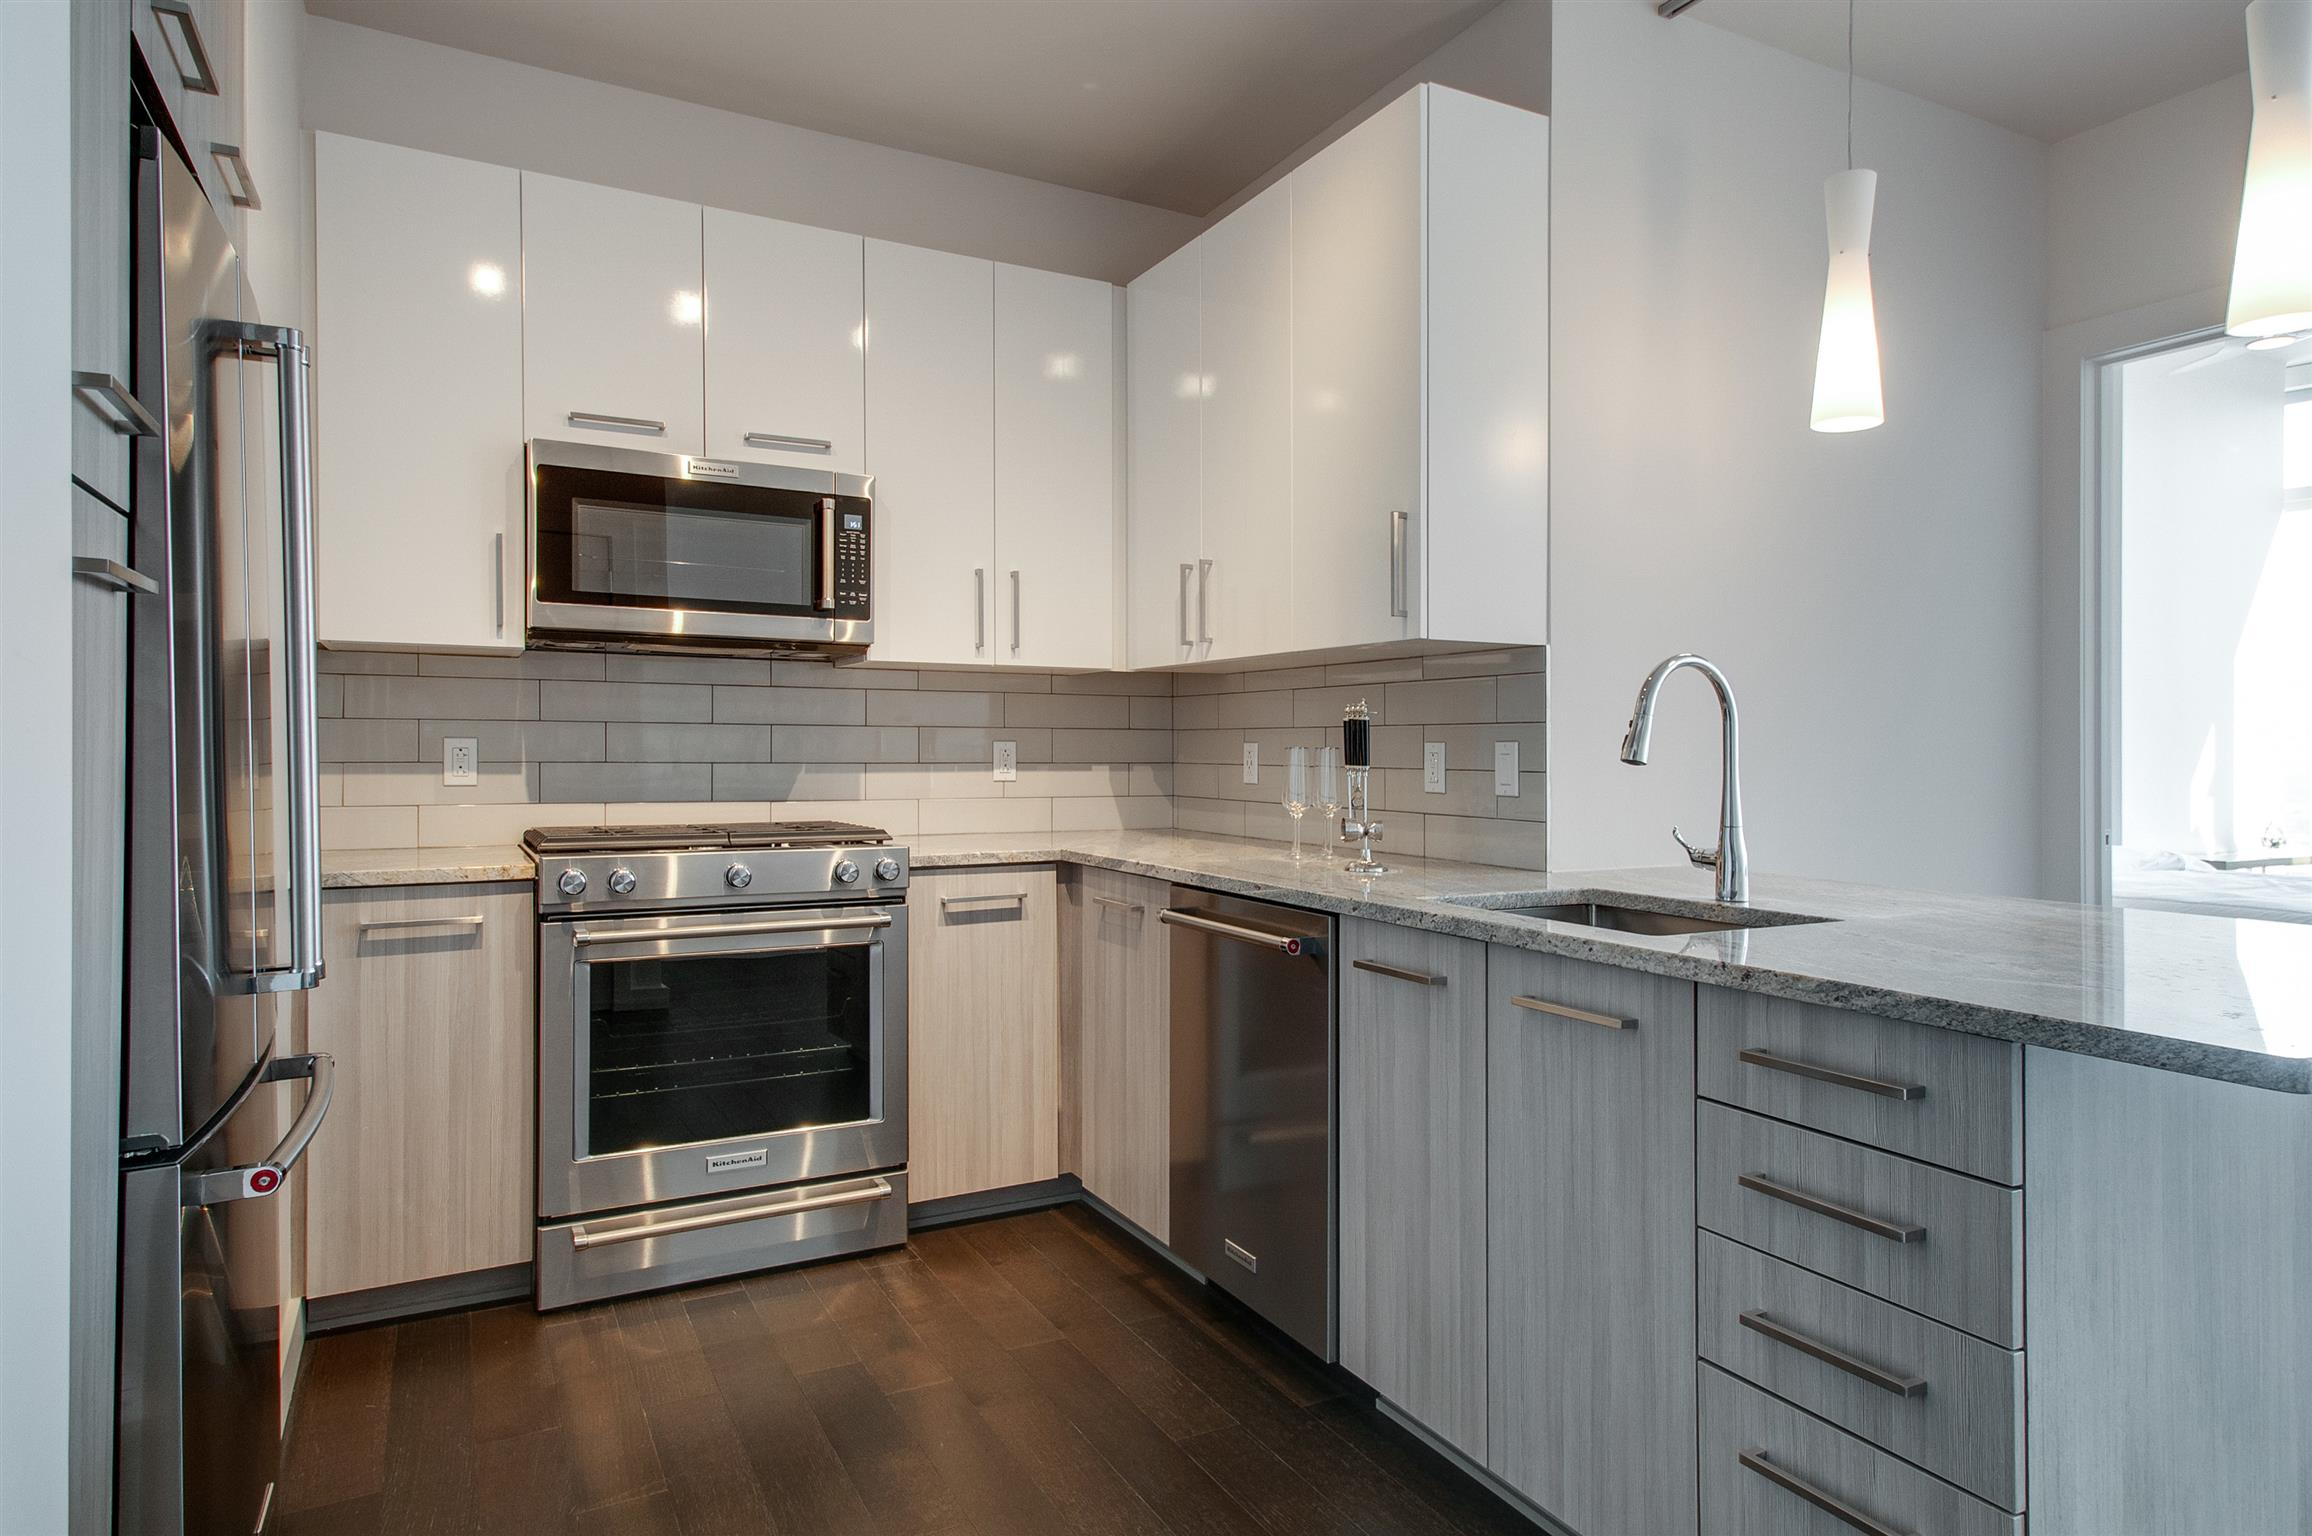 515 Church Street, #3905, Nashville, TN 37219 - Nashville, TN real estate listing